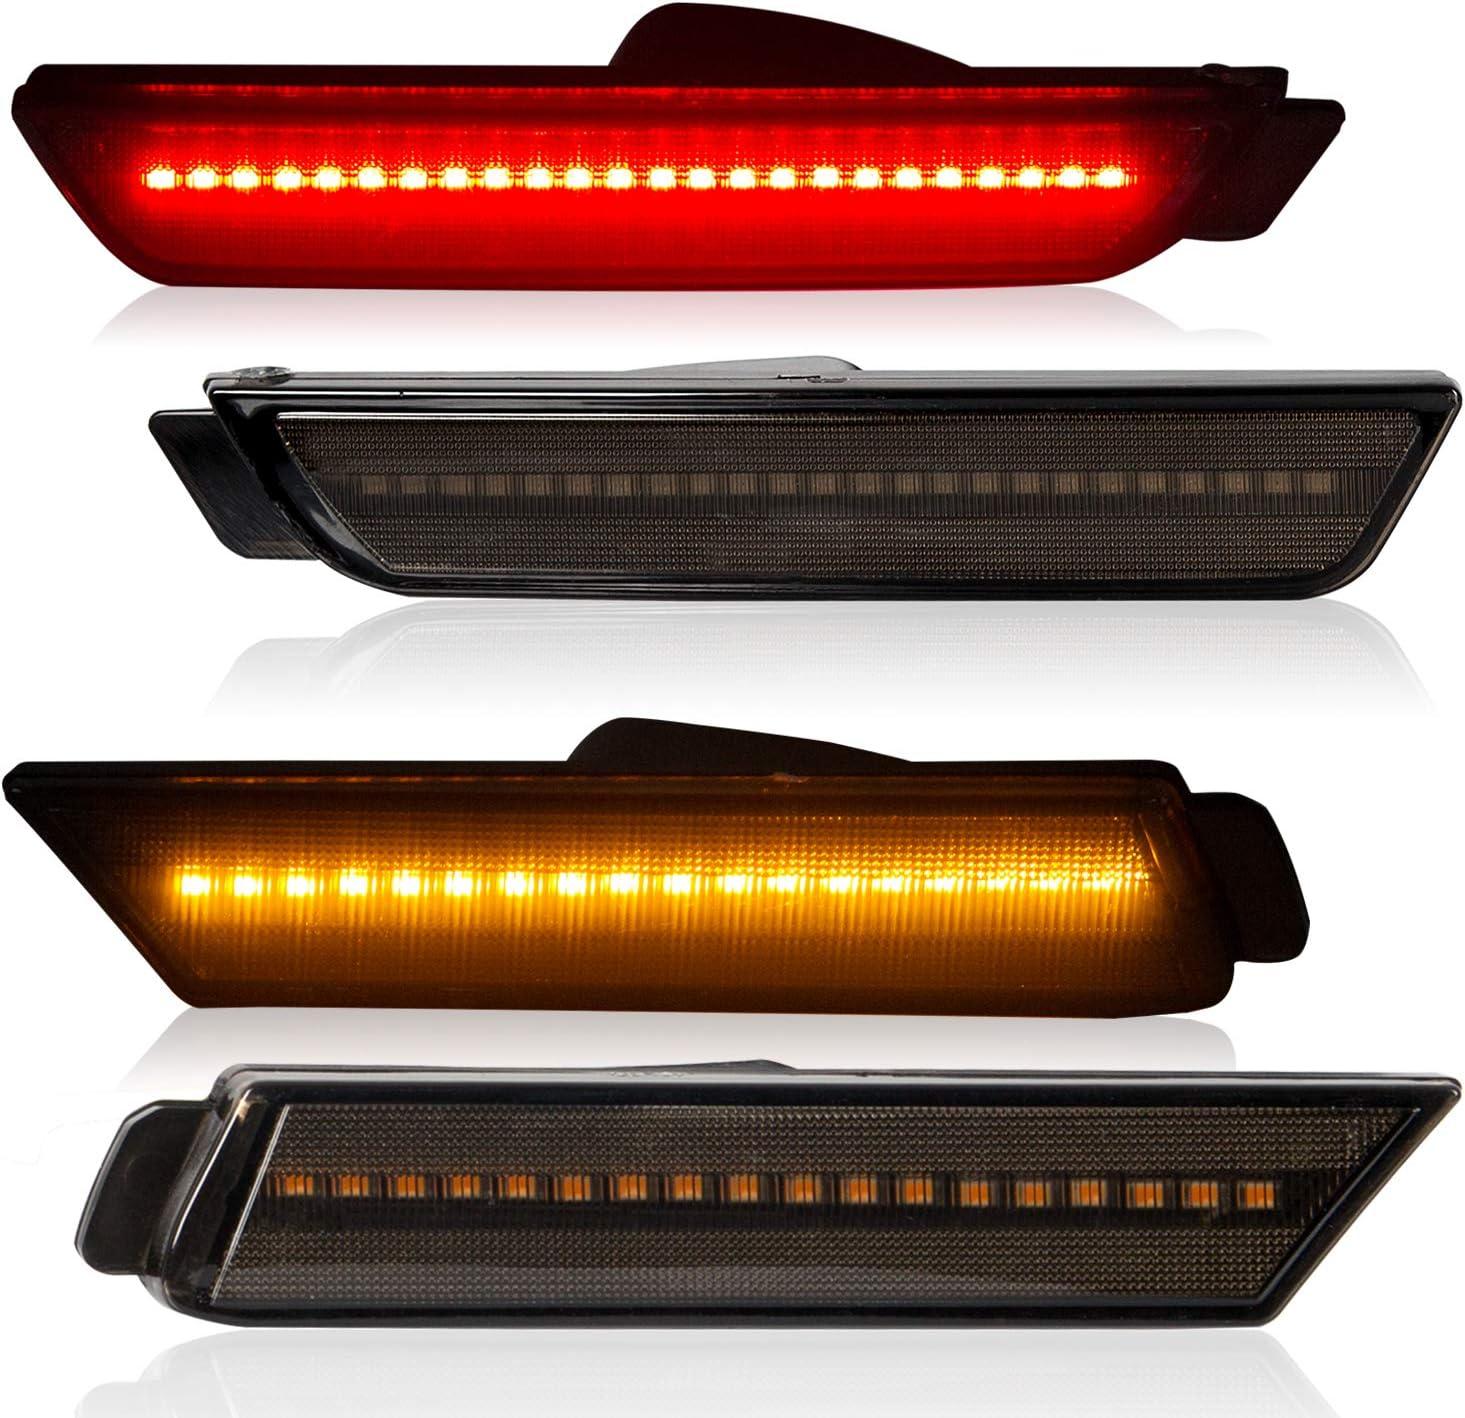 Front Rear Led Bumper Side Marker Lamp Light Nashville-Davidson Mall Lens Co Smoked Year-end gift 4Pcs